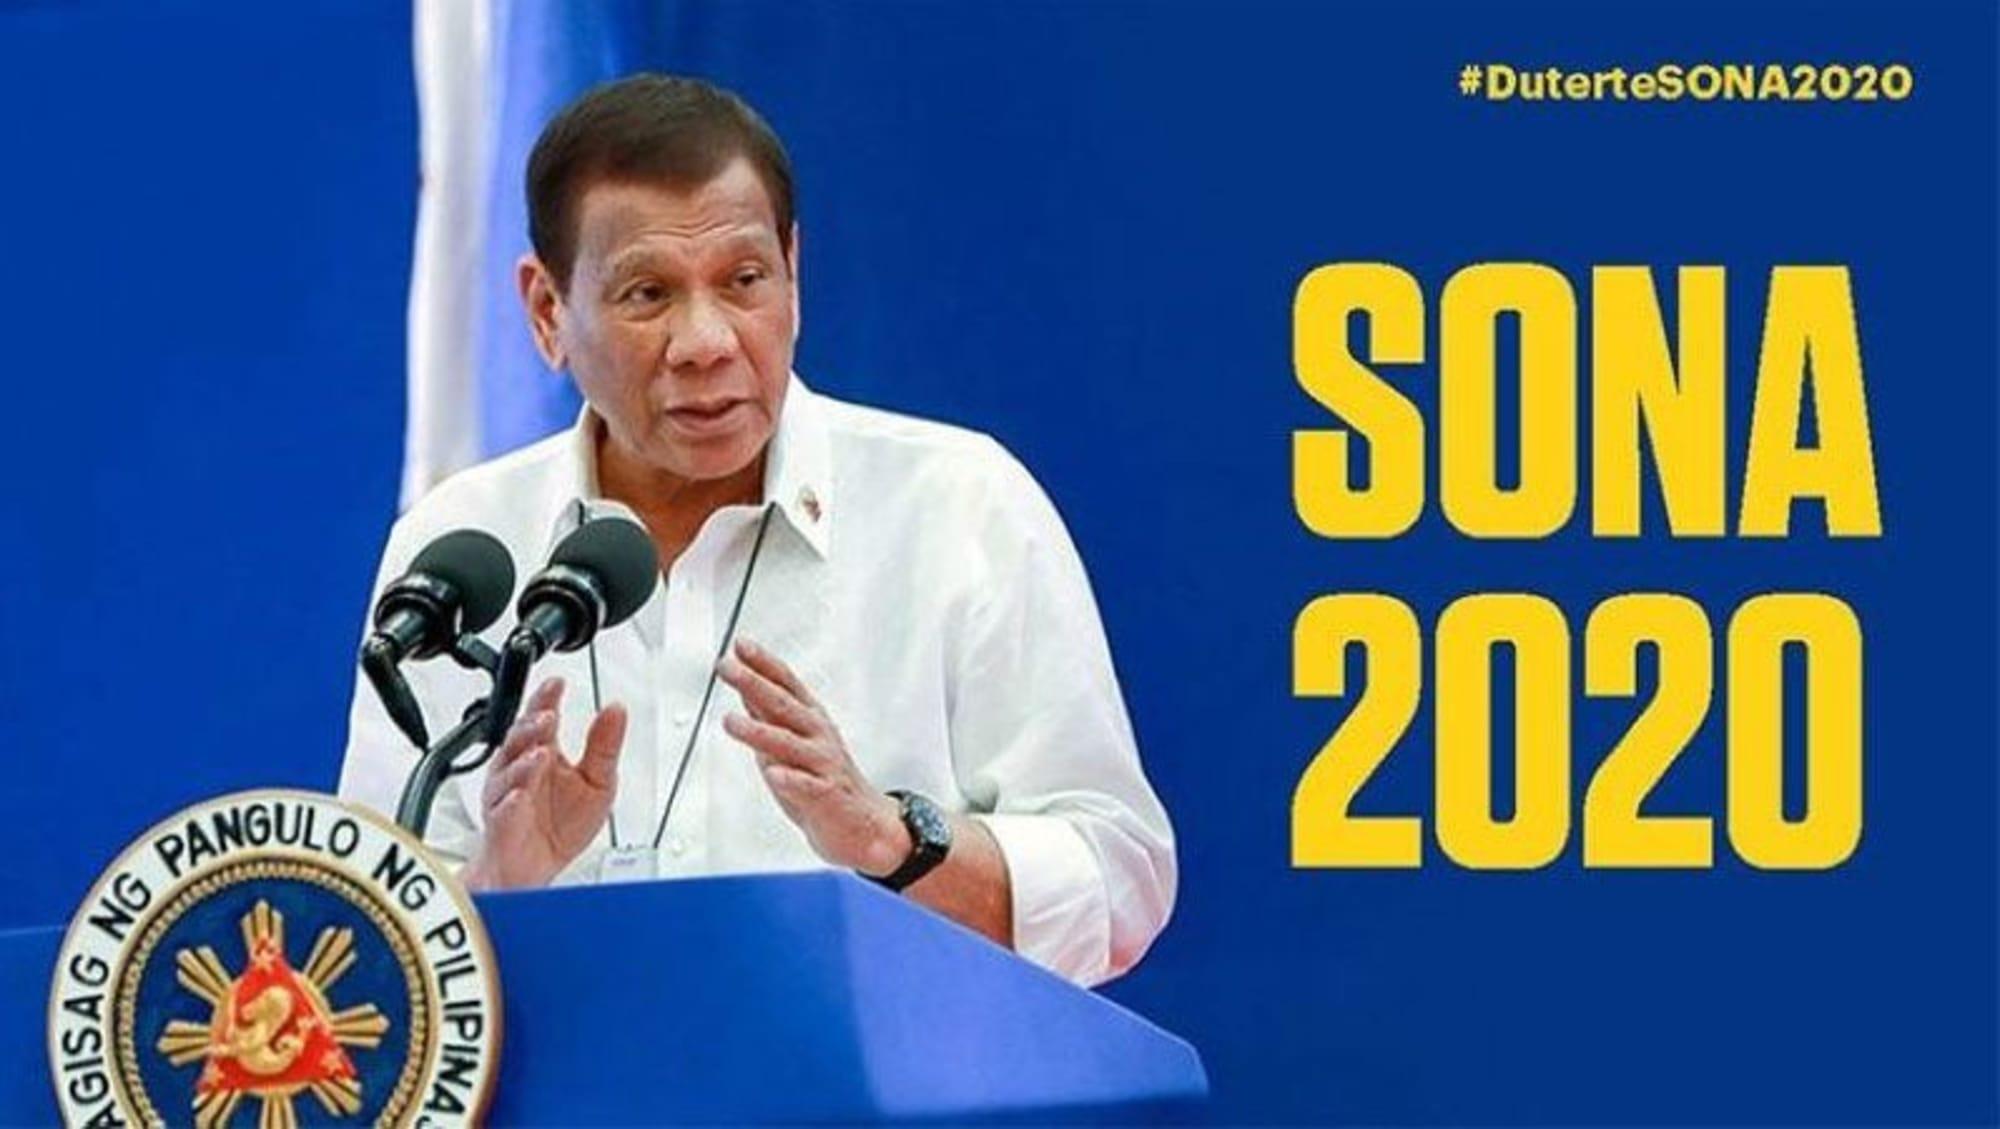 Duterte asks Congress to enact BIDA